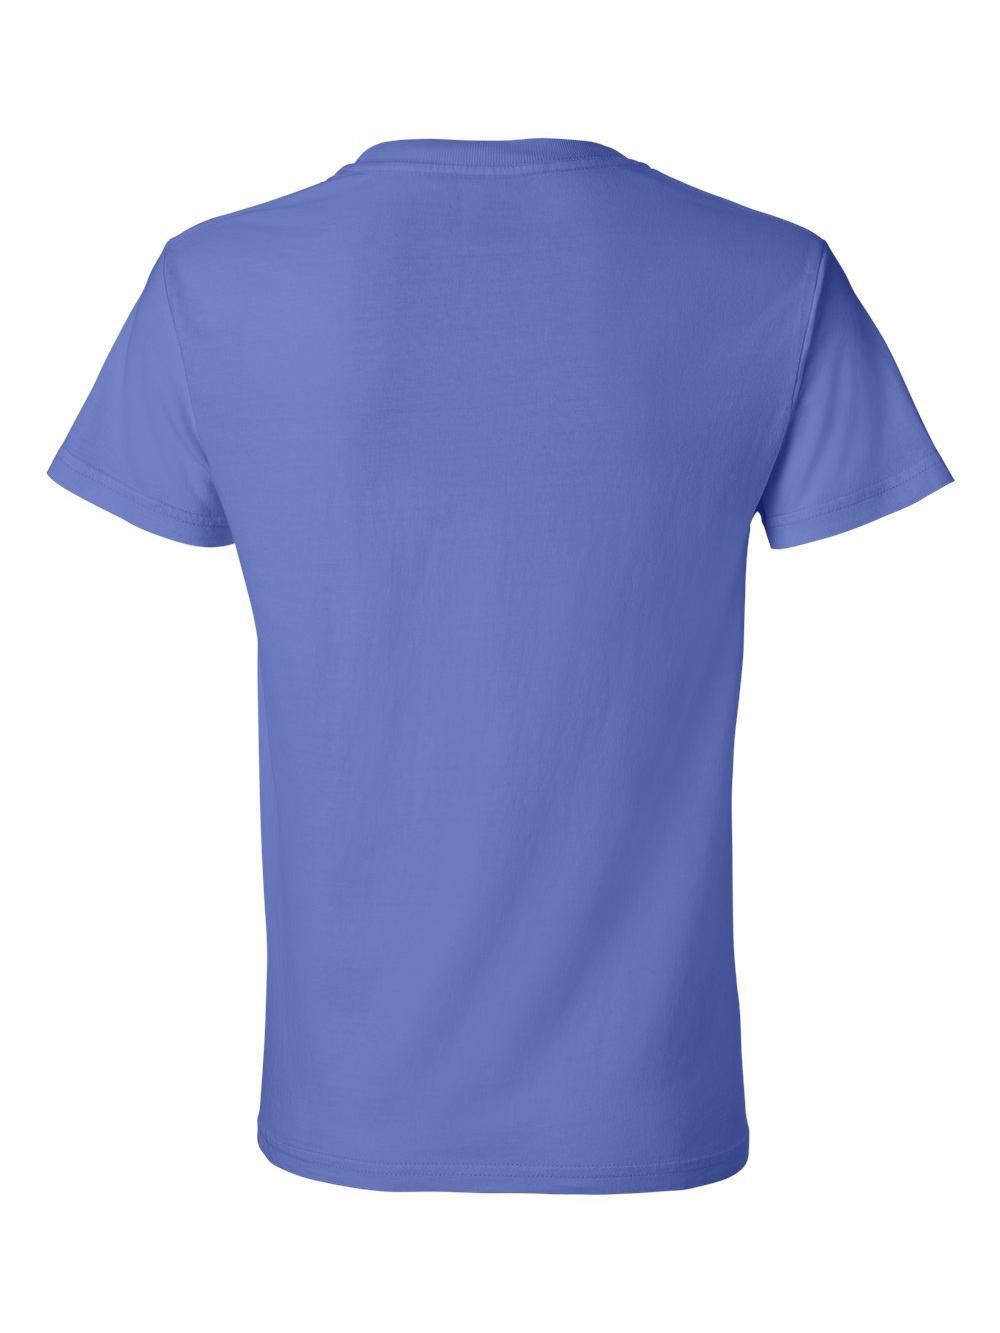 Comfort-Colors-Pigment-Dyed-Ringspun-Women-039-s-Short-Sleeve-T-Shirt-3333 thumbnail 18